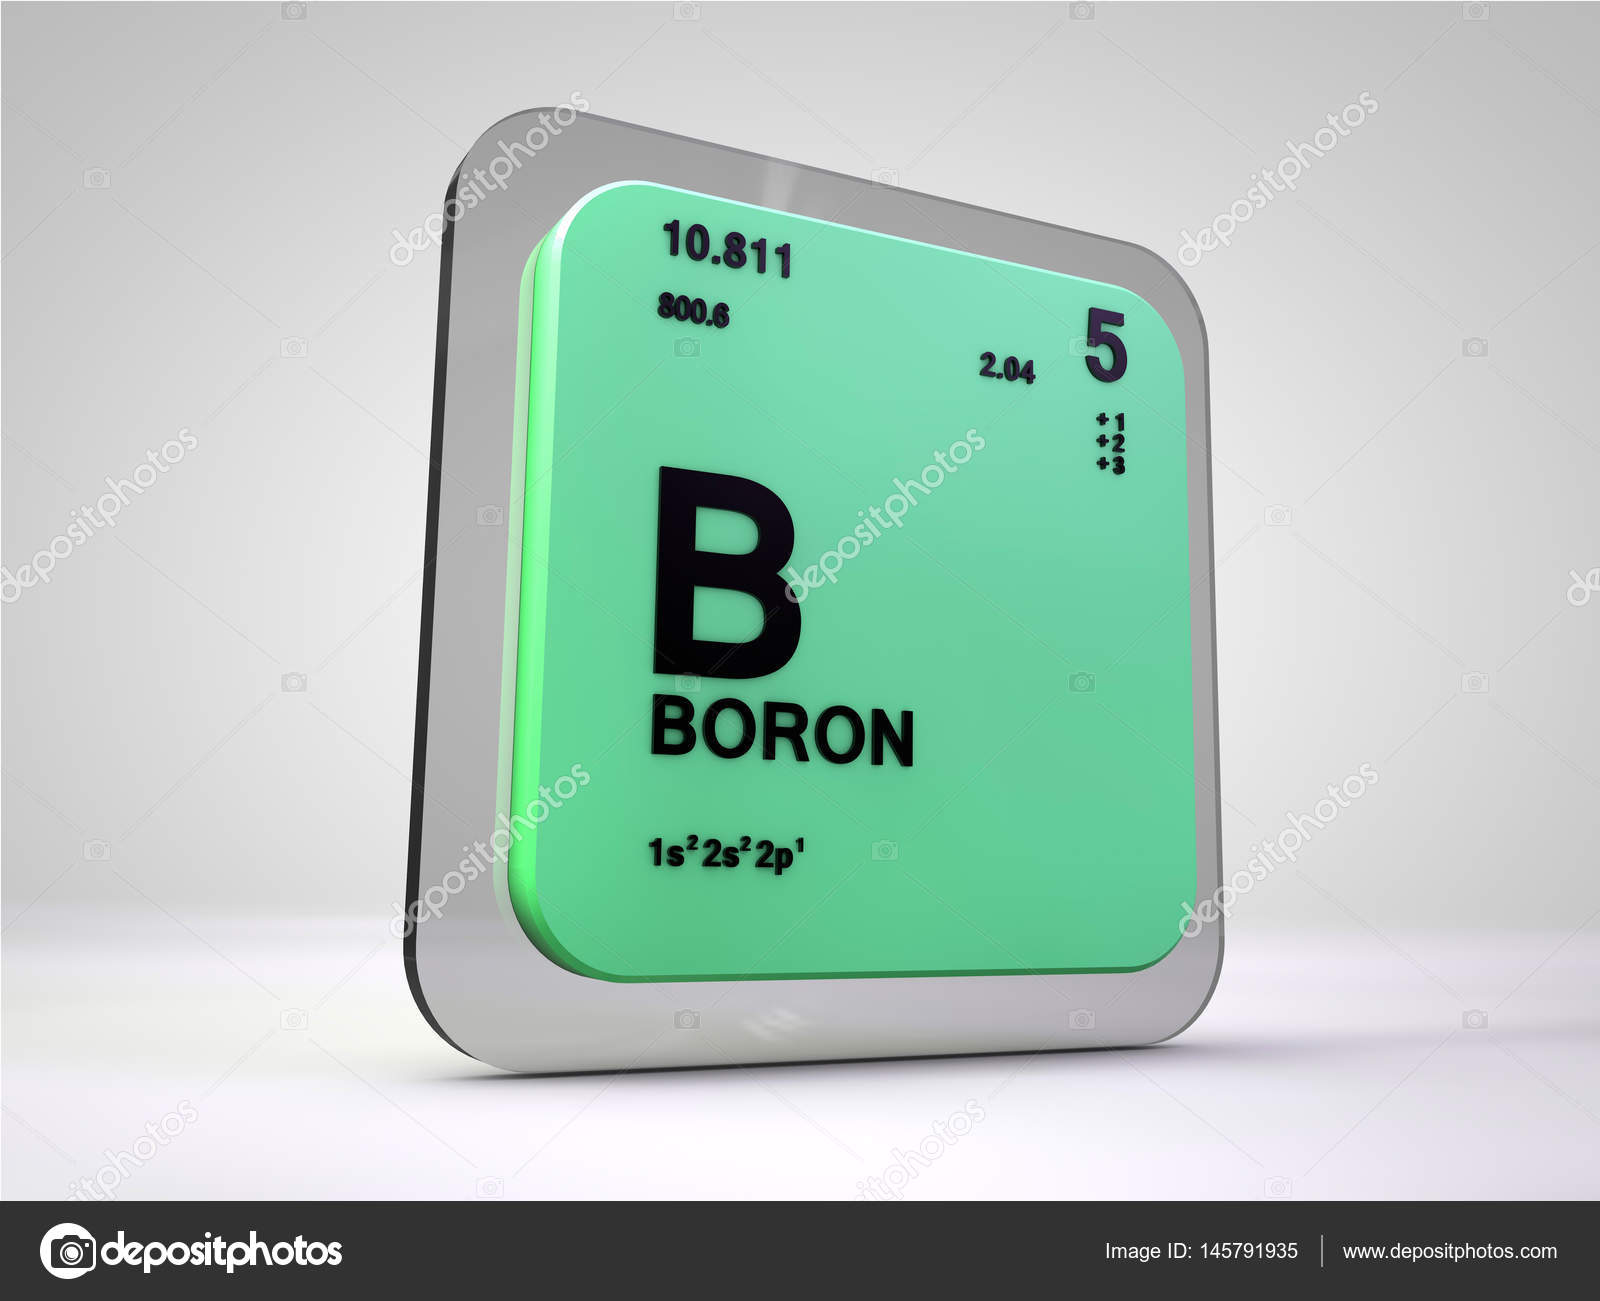 Boro b elemento qumico tabla peridica 3d render foto de boro b elemento qumico tabla peridica 3d render urtaz Gallery